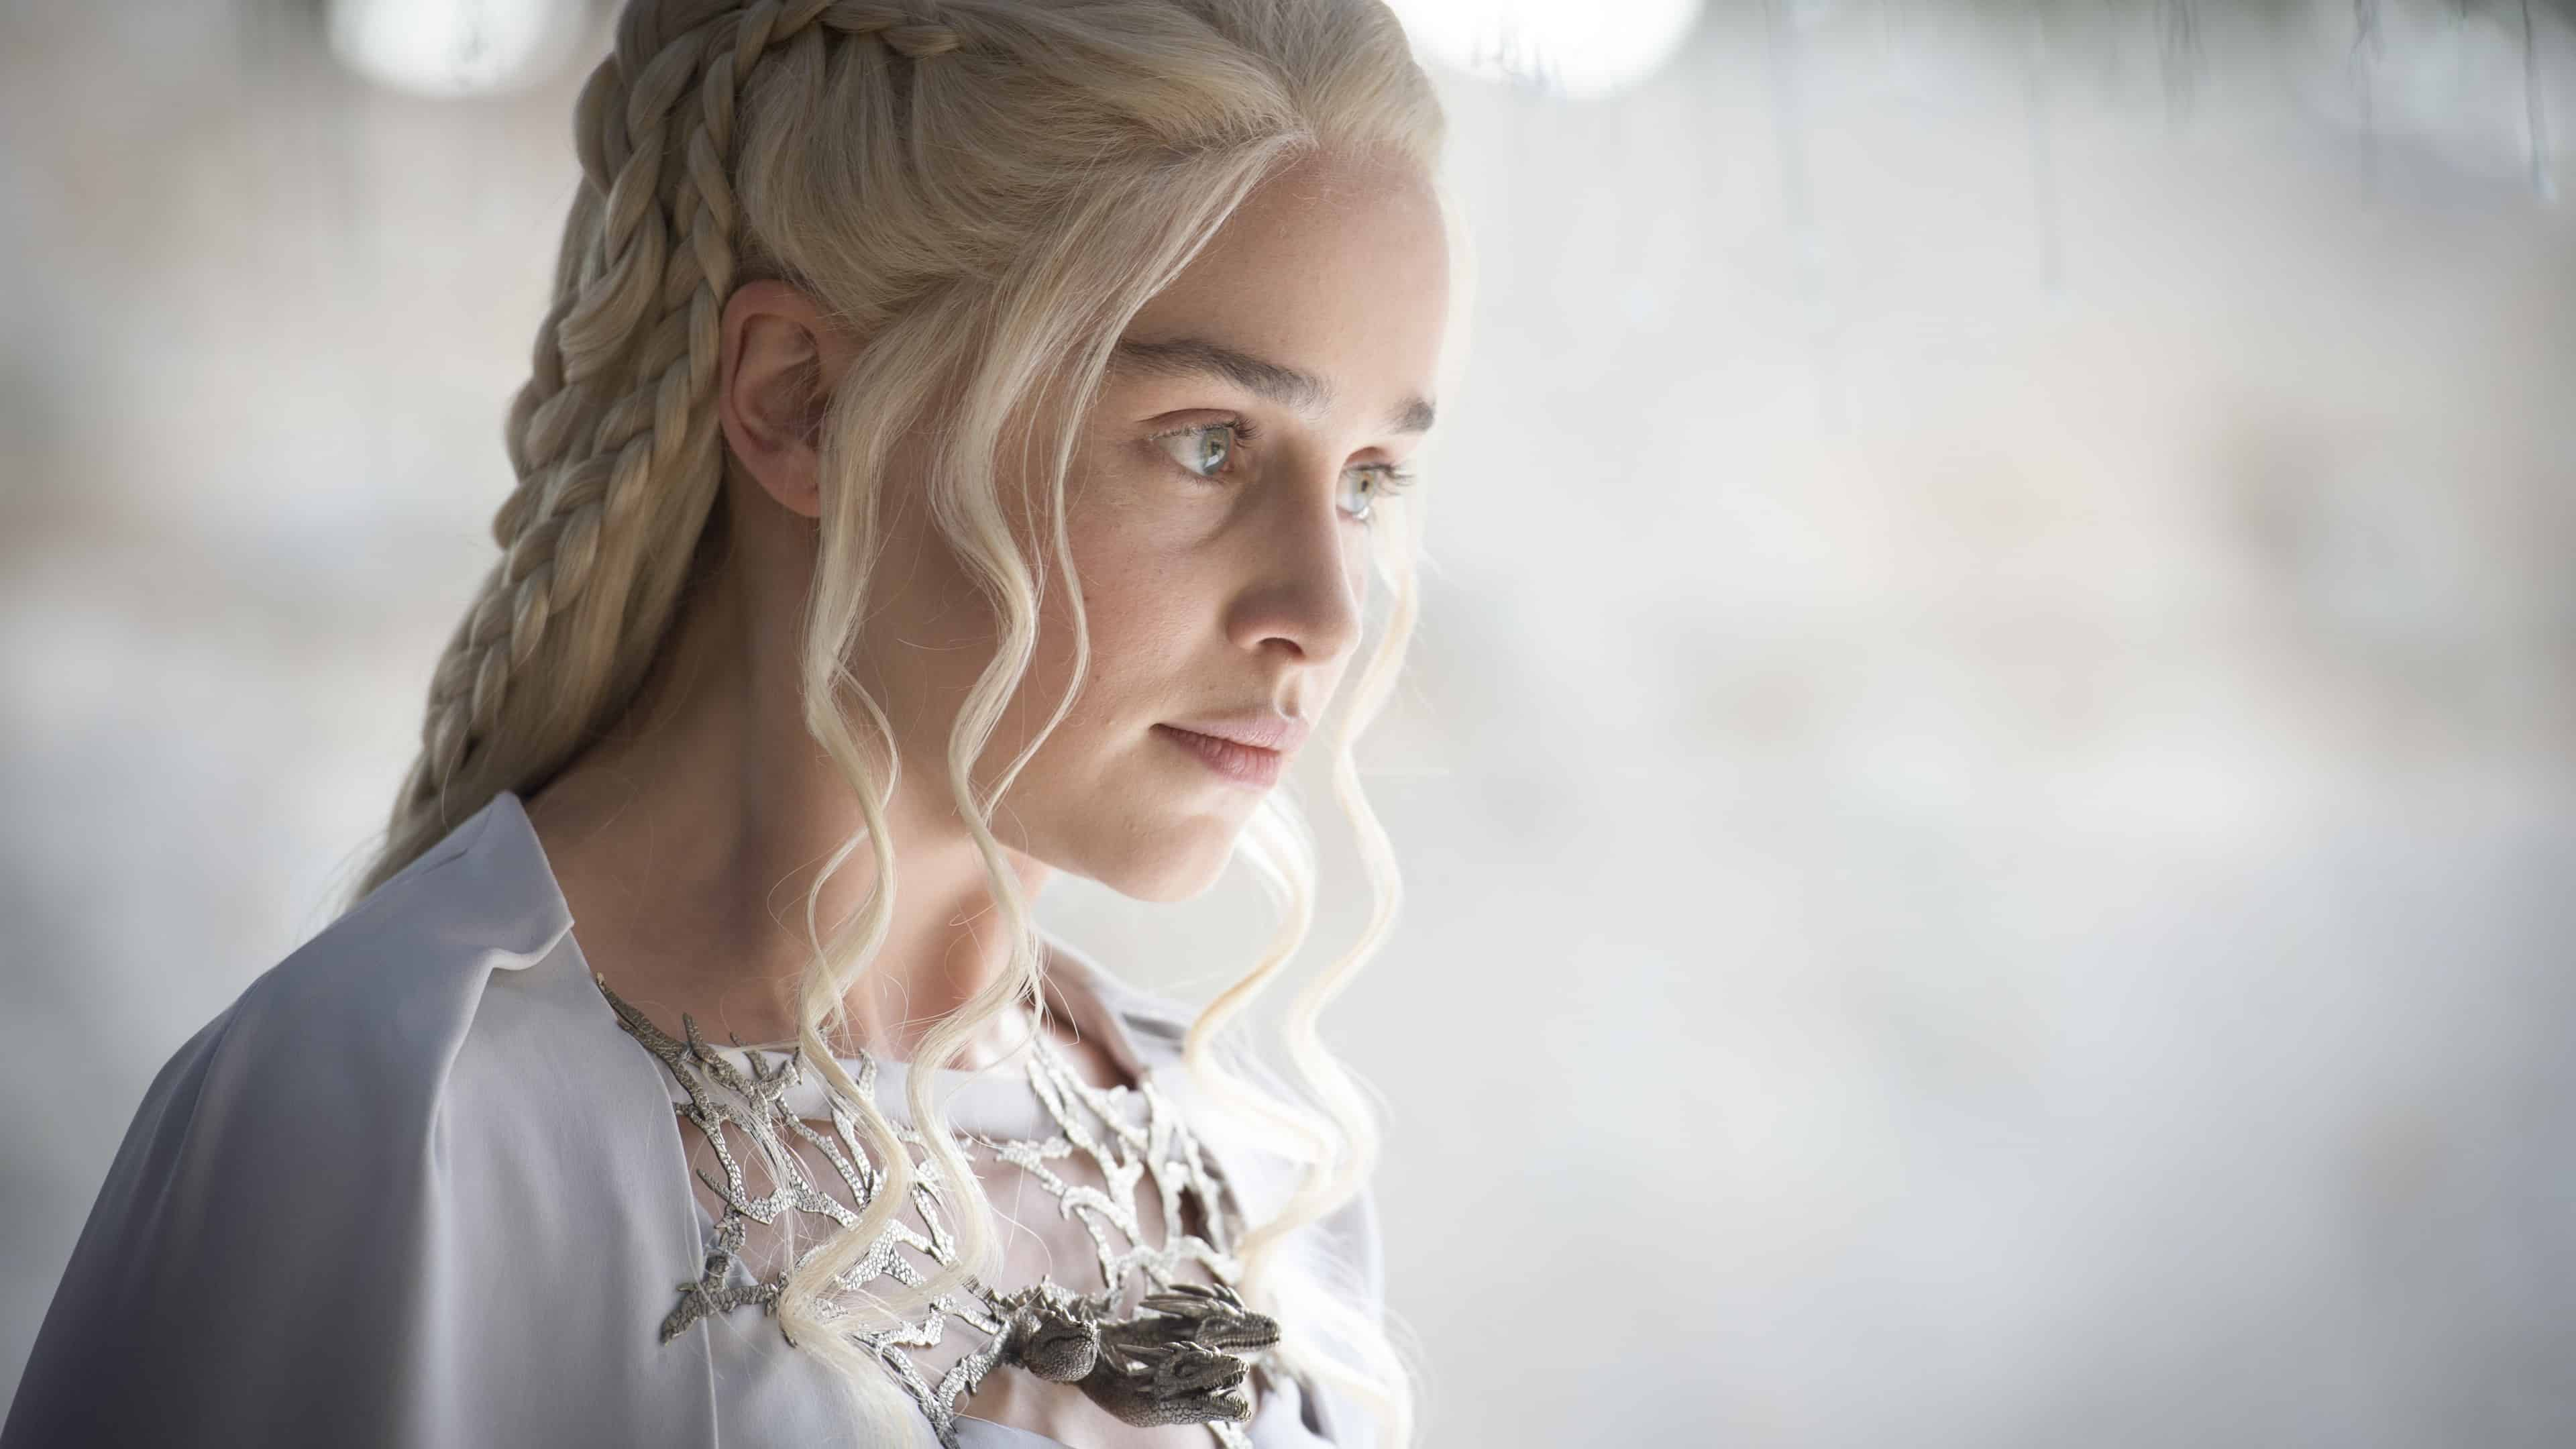 Game Of Thrones Mother Of Dragons Daenerys Targaryen Uhd 4k